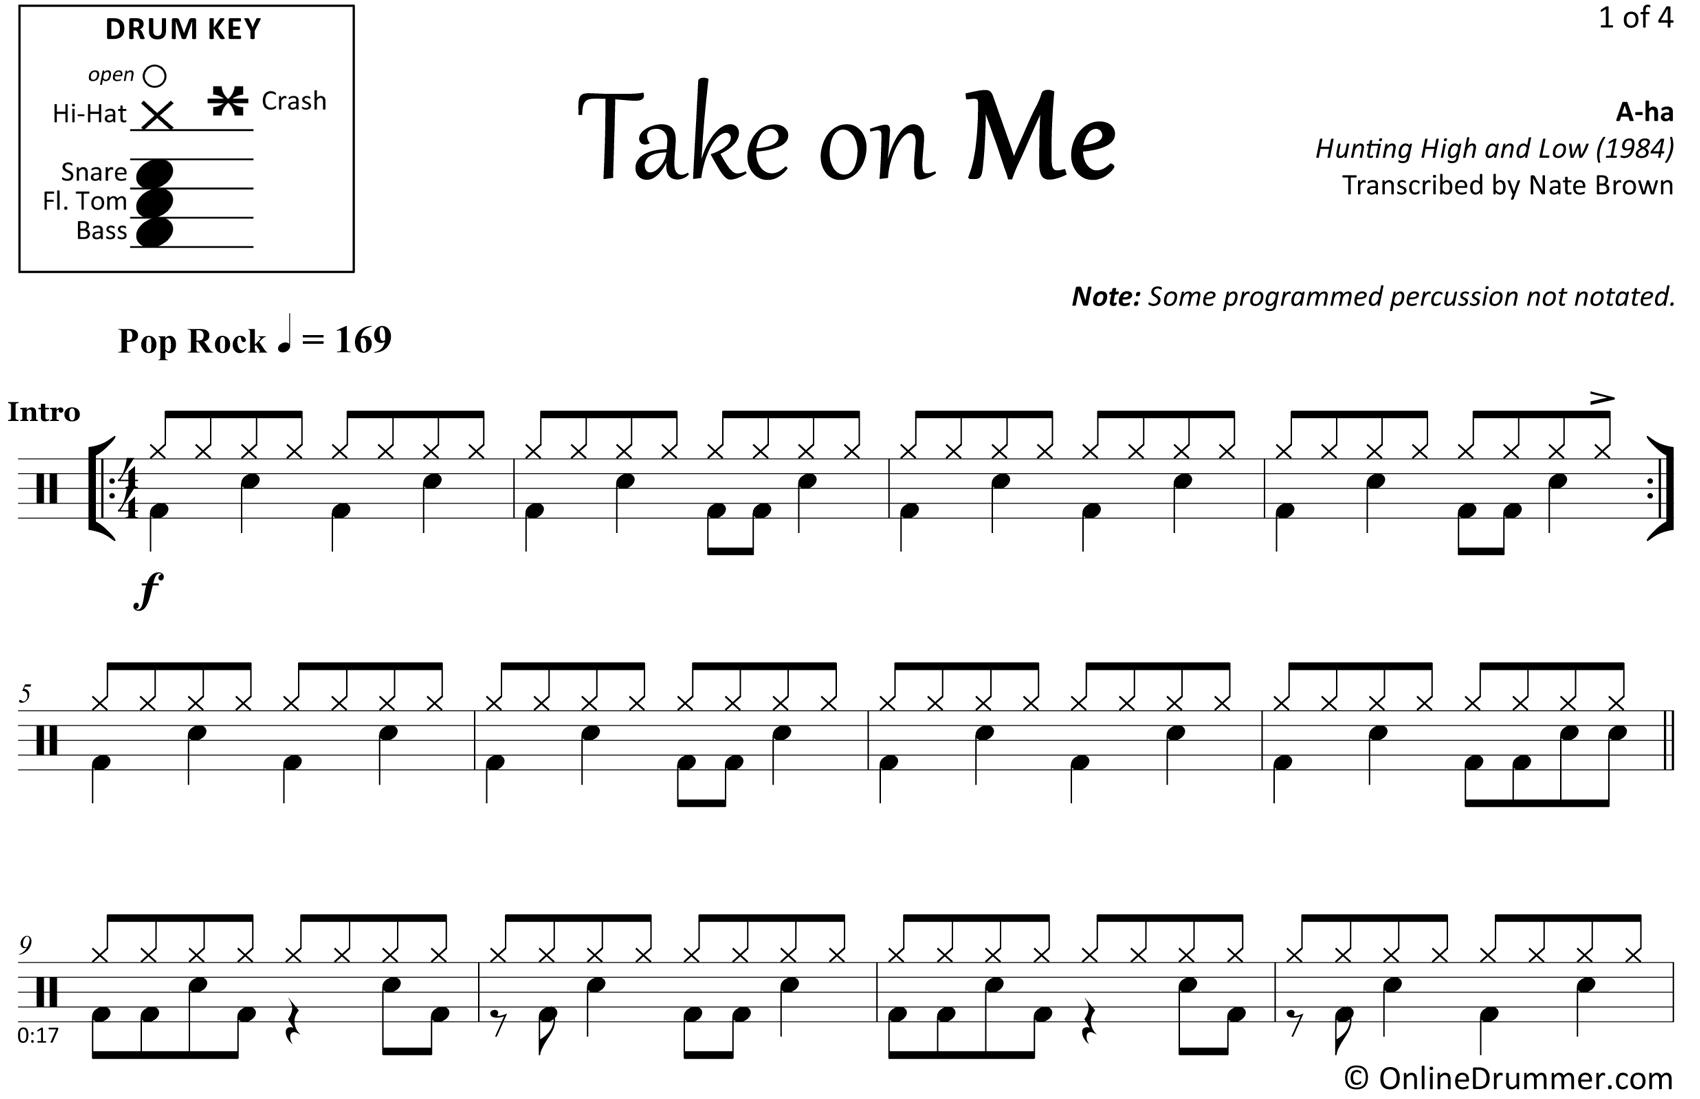 Take On Me - A-ha - Drum Sheet Music